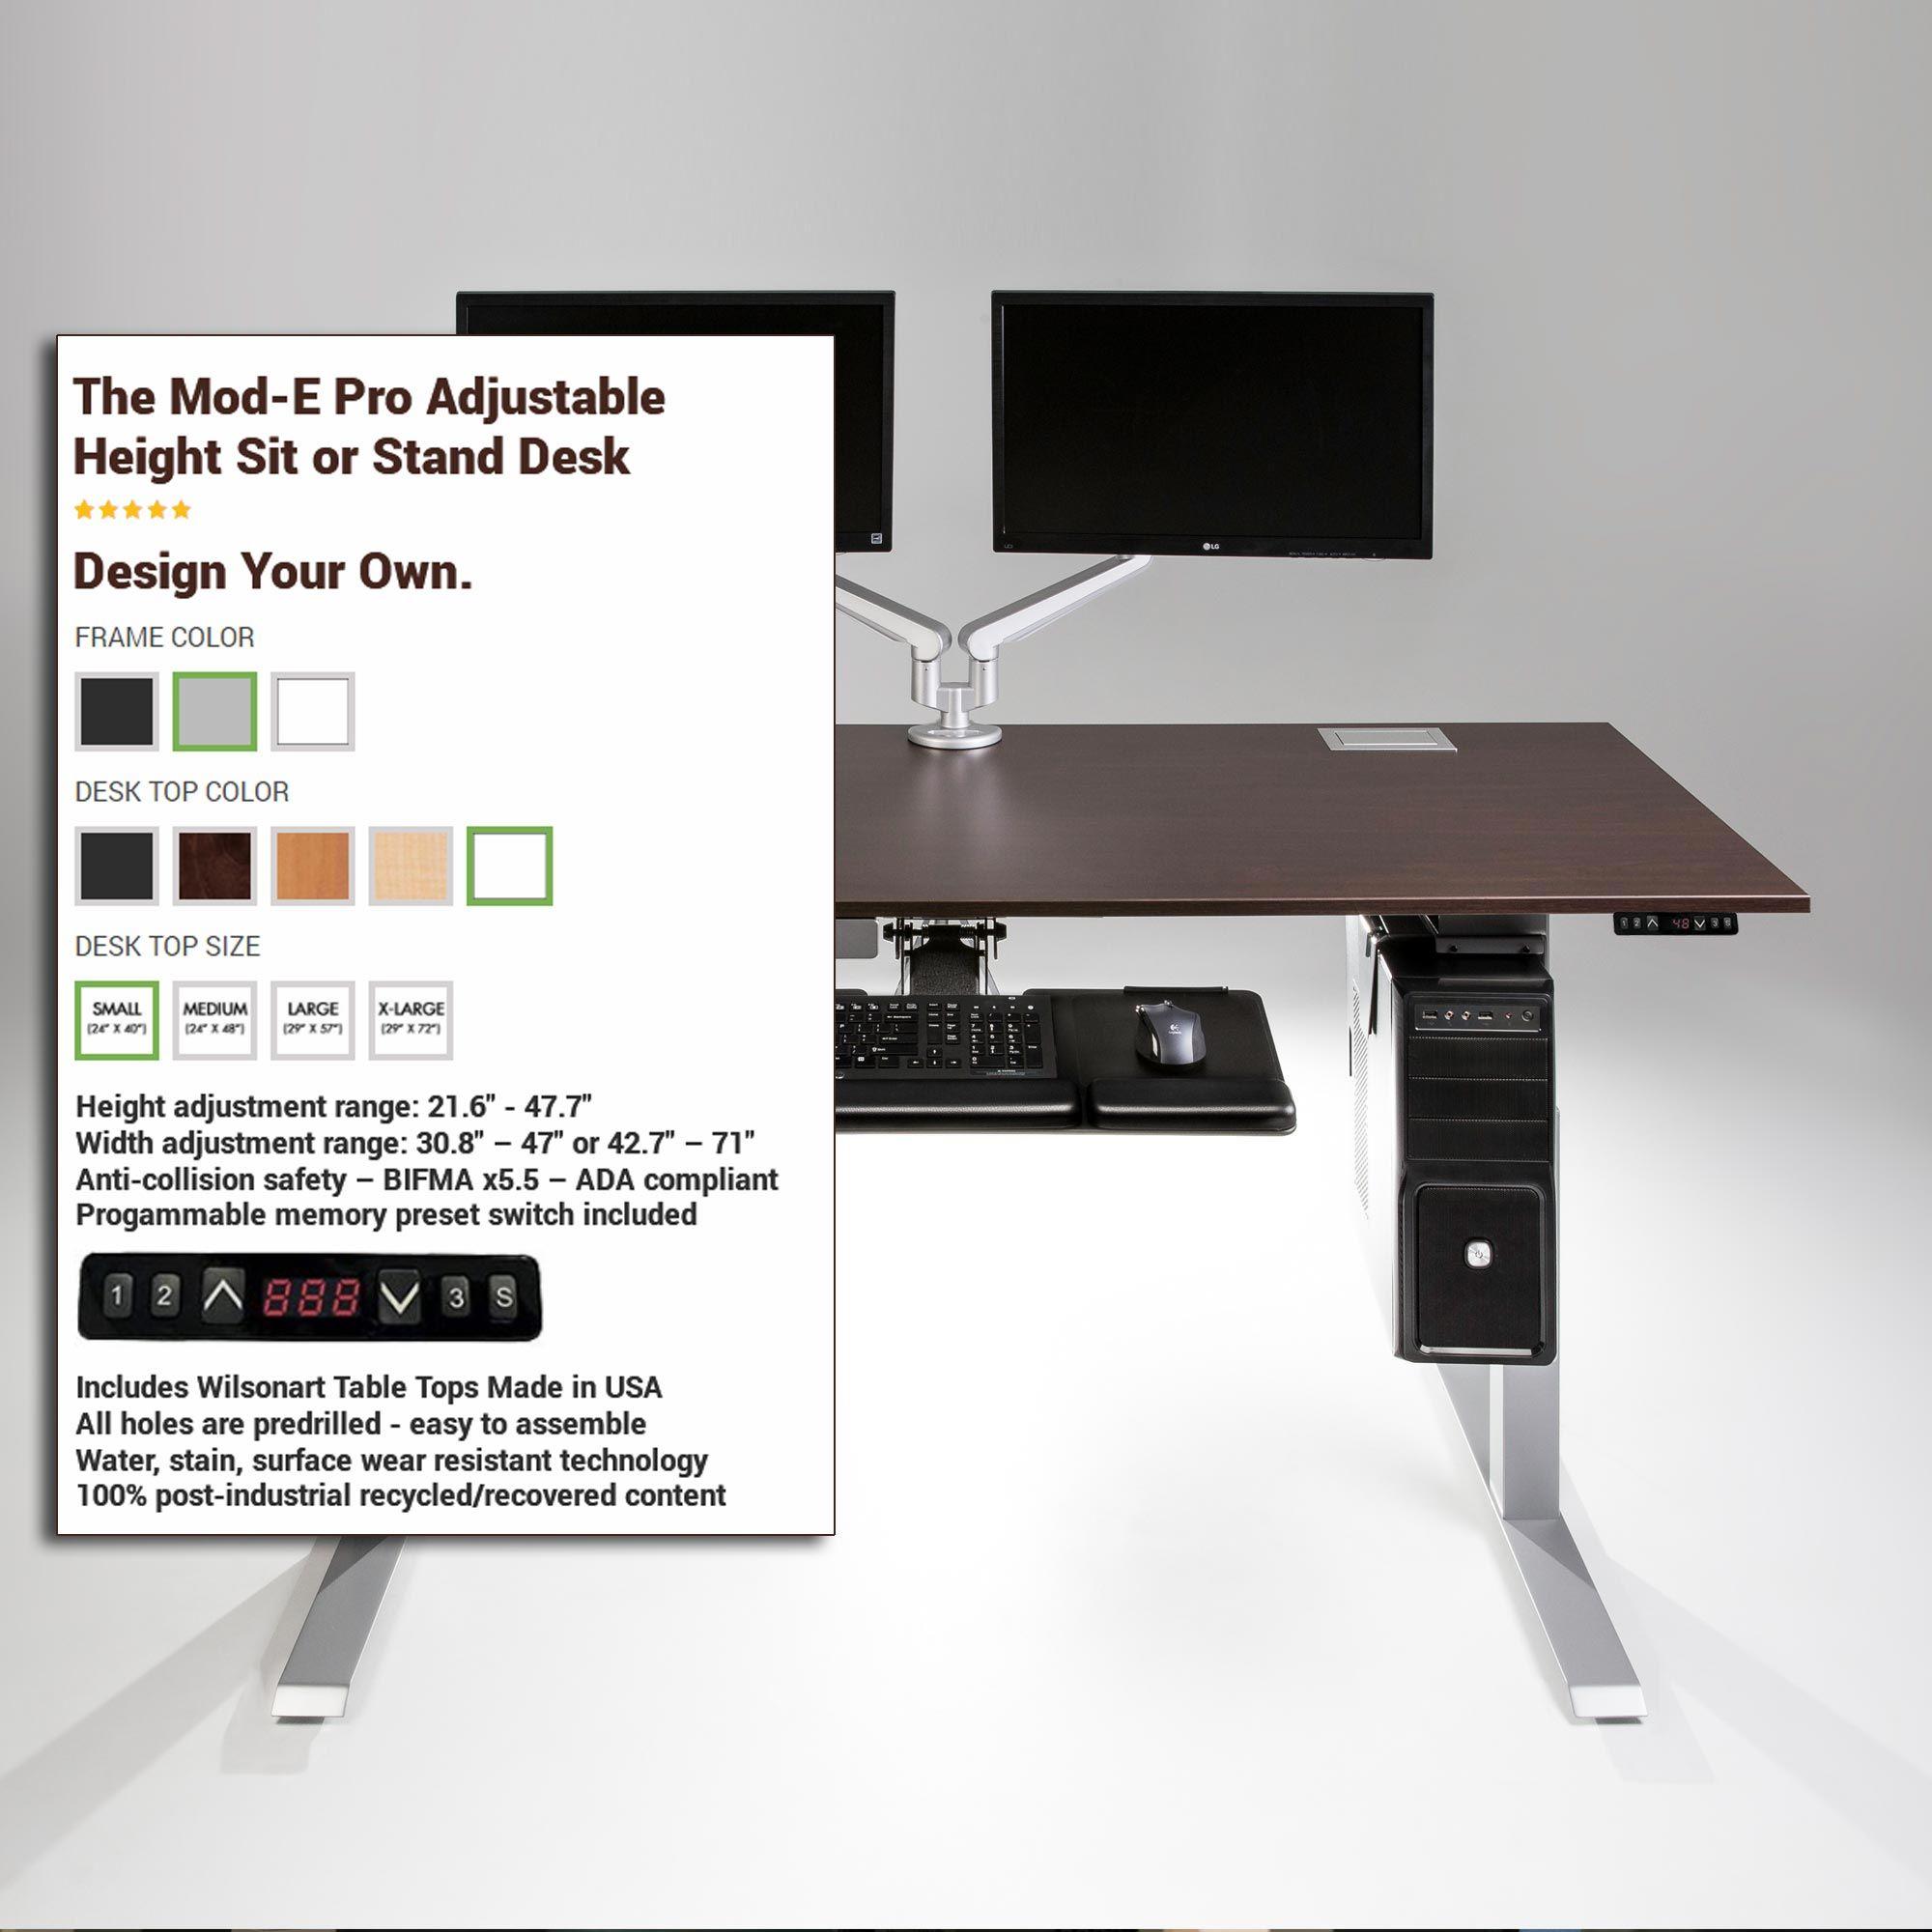 The Mod E Pro Electric Standing Desk Desk Electric Standing Desk Adjustable Height Standing Desk